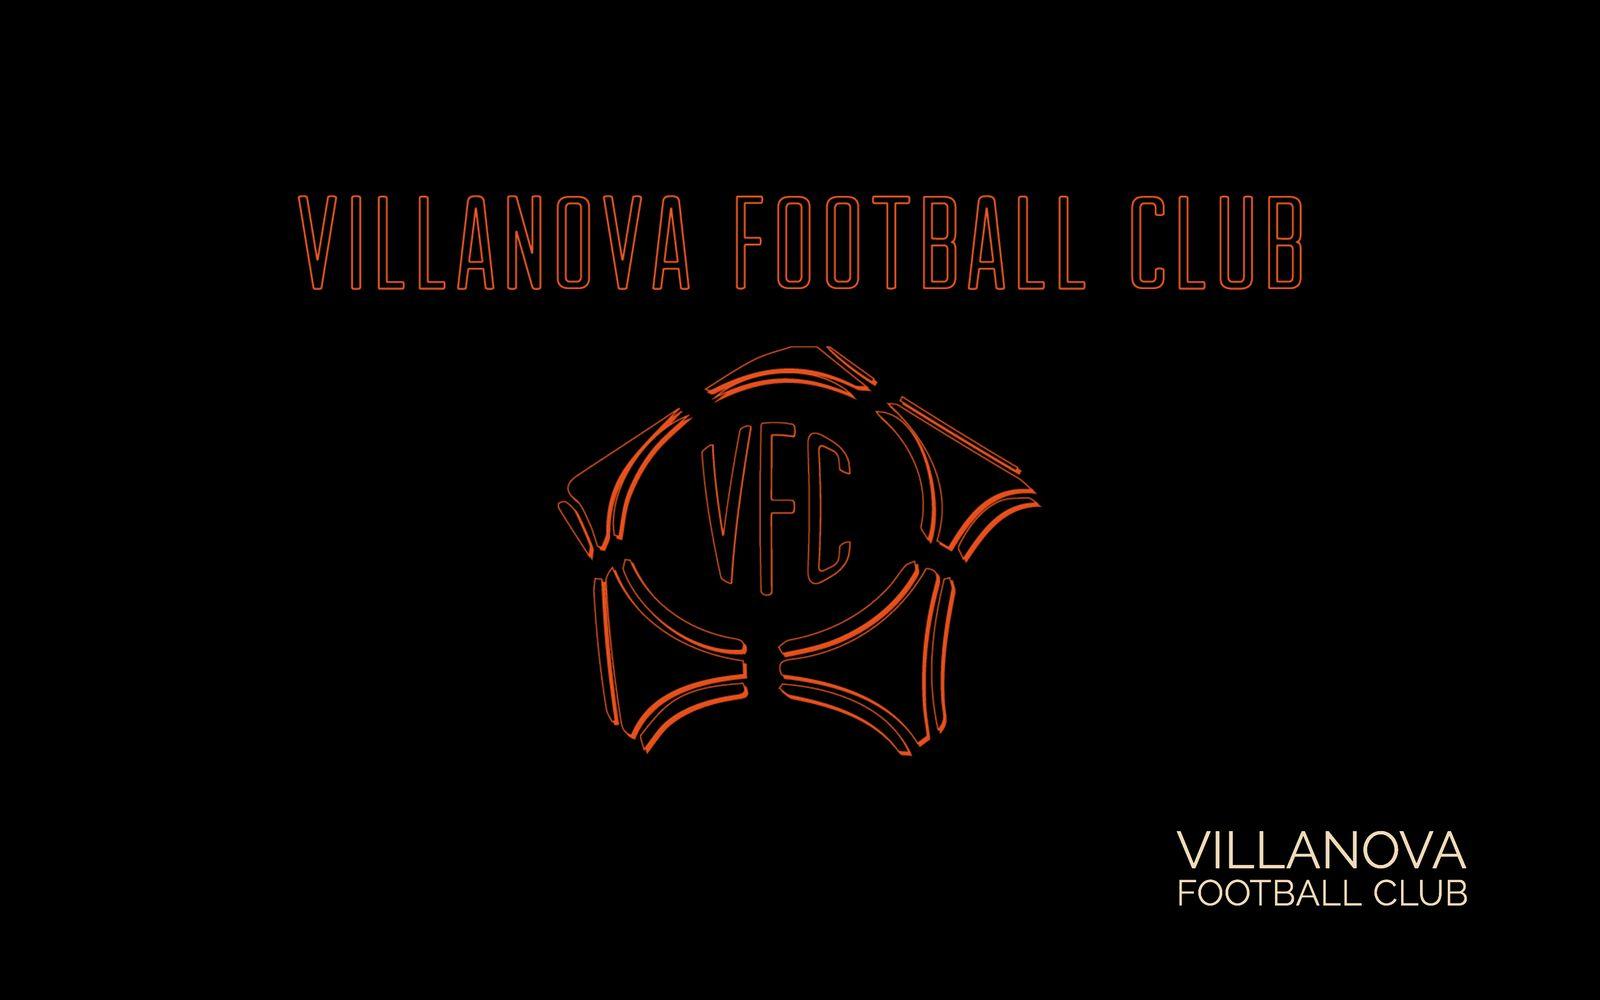 villanova-football-club